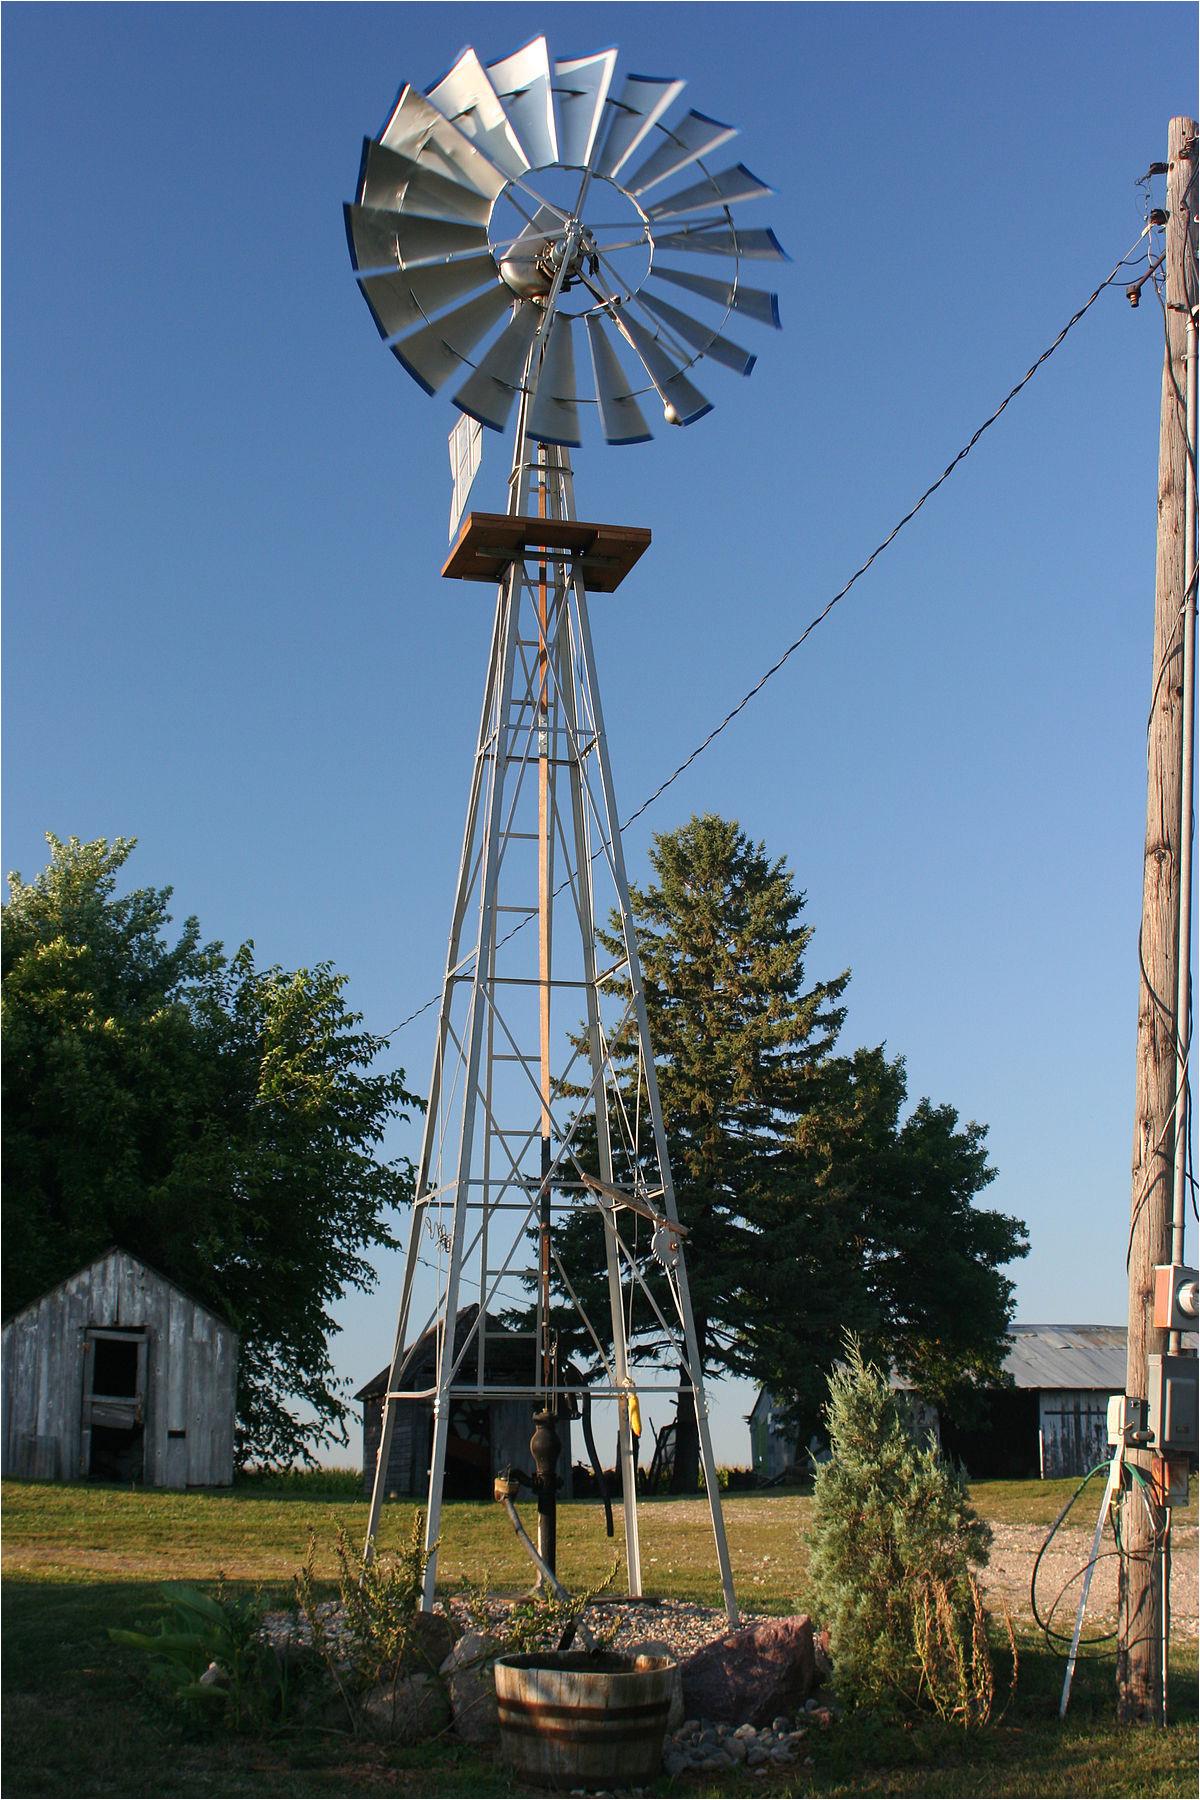 1200px water pumping windmill jpg